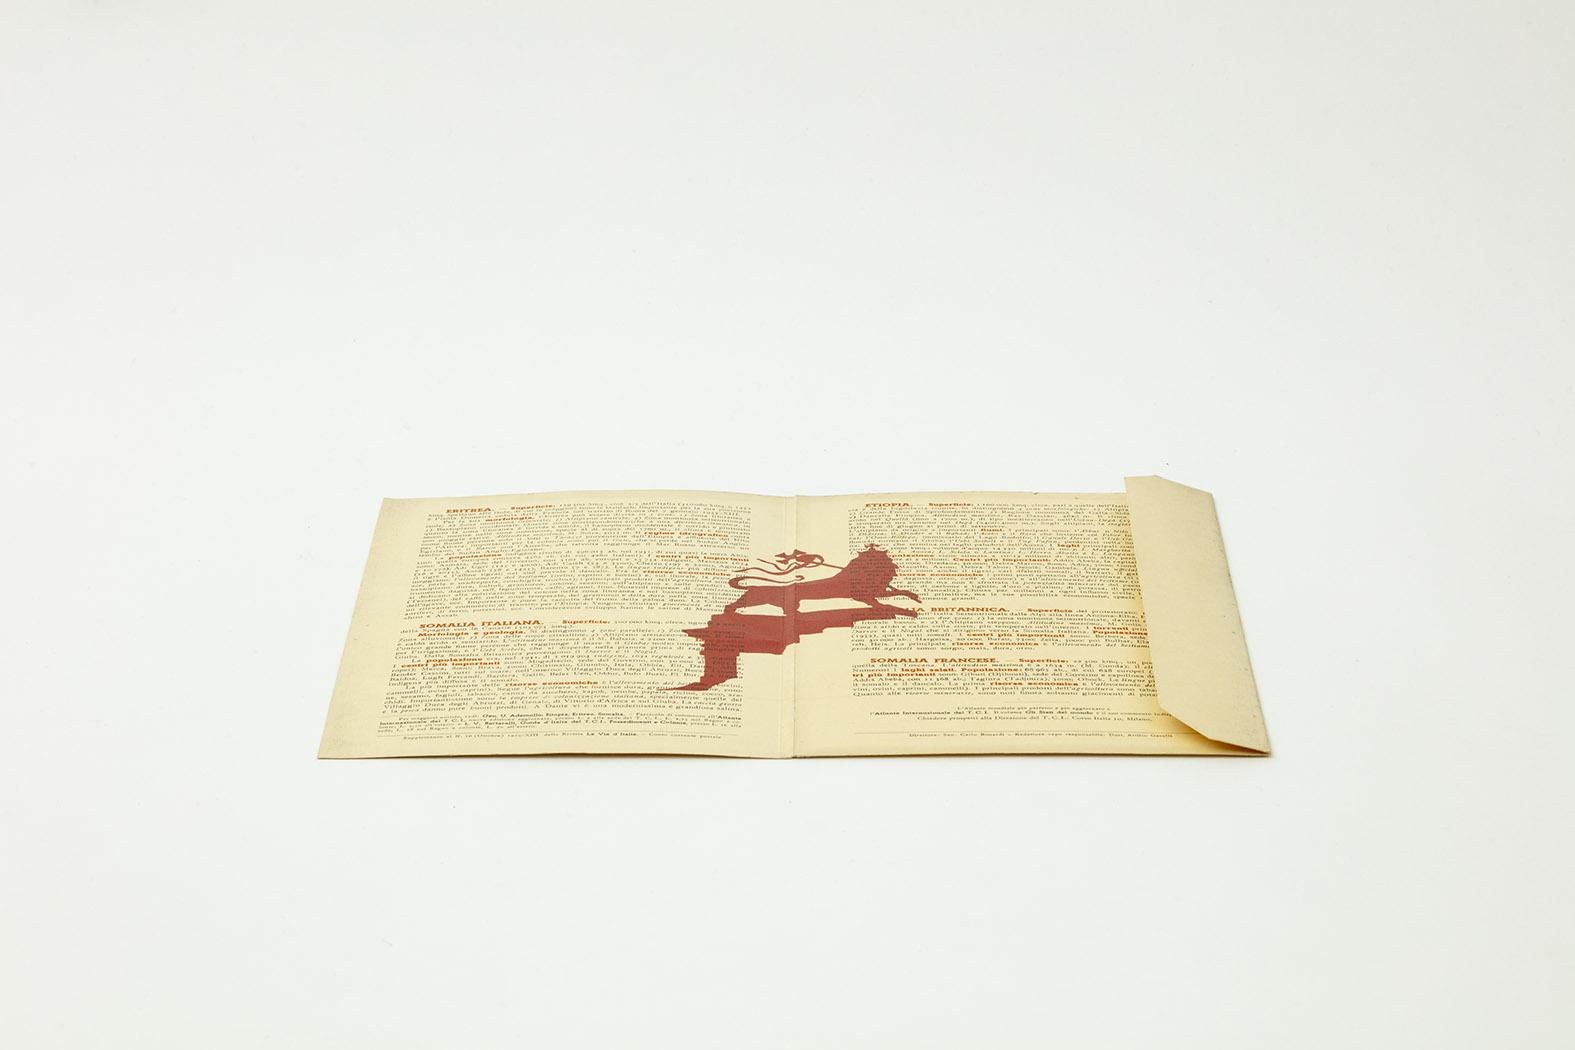 Stampa diretta su sovracopertina originale 1938